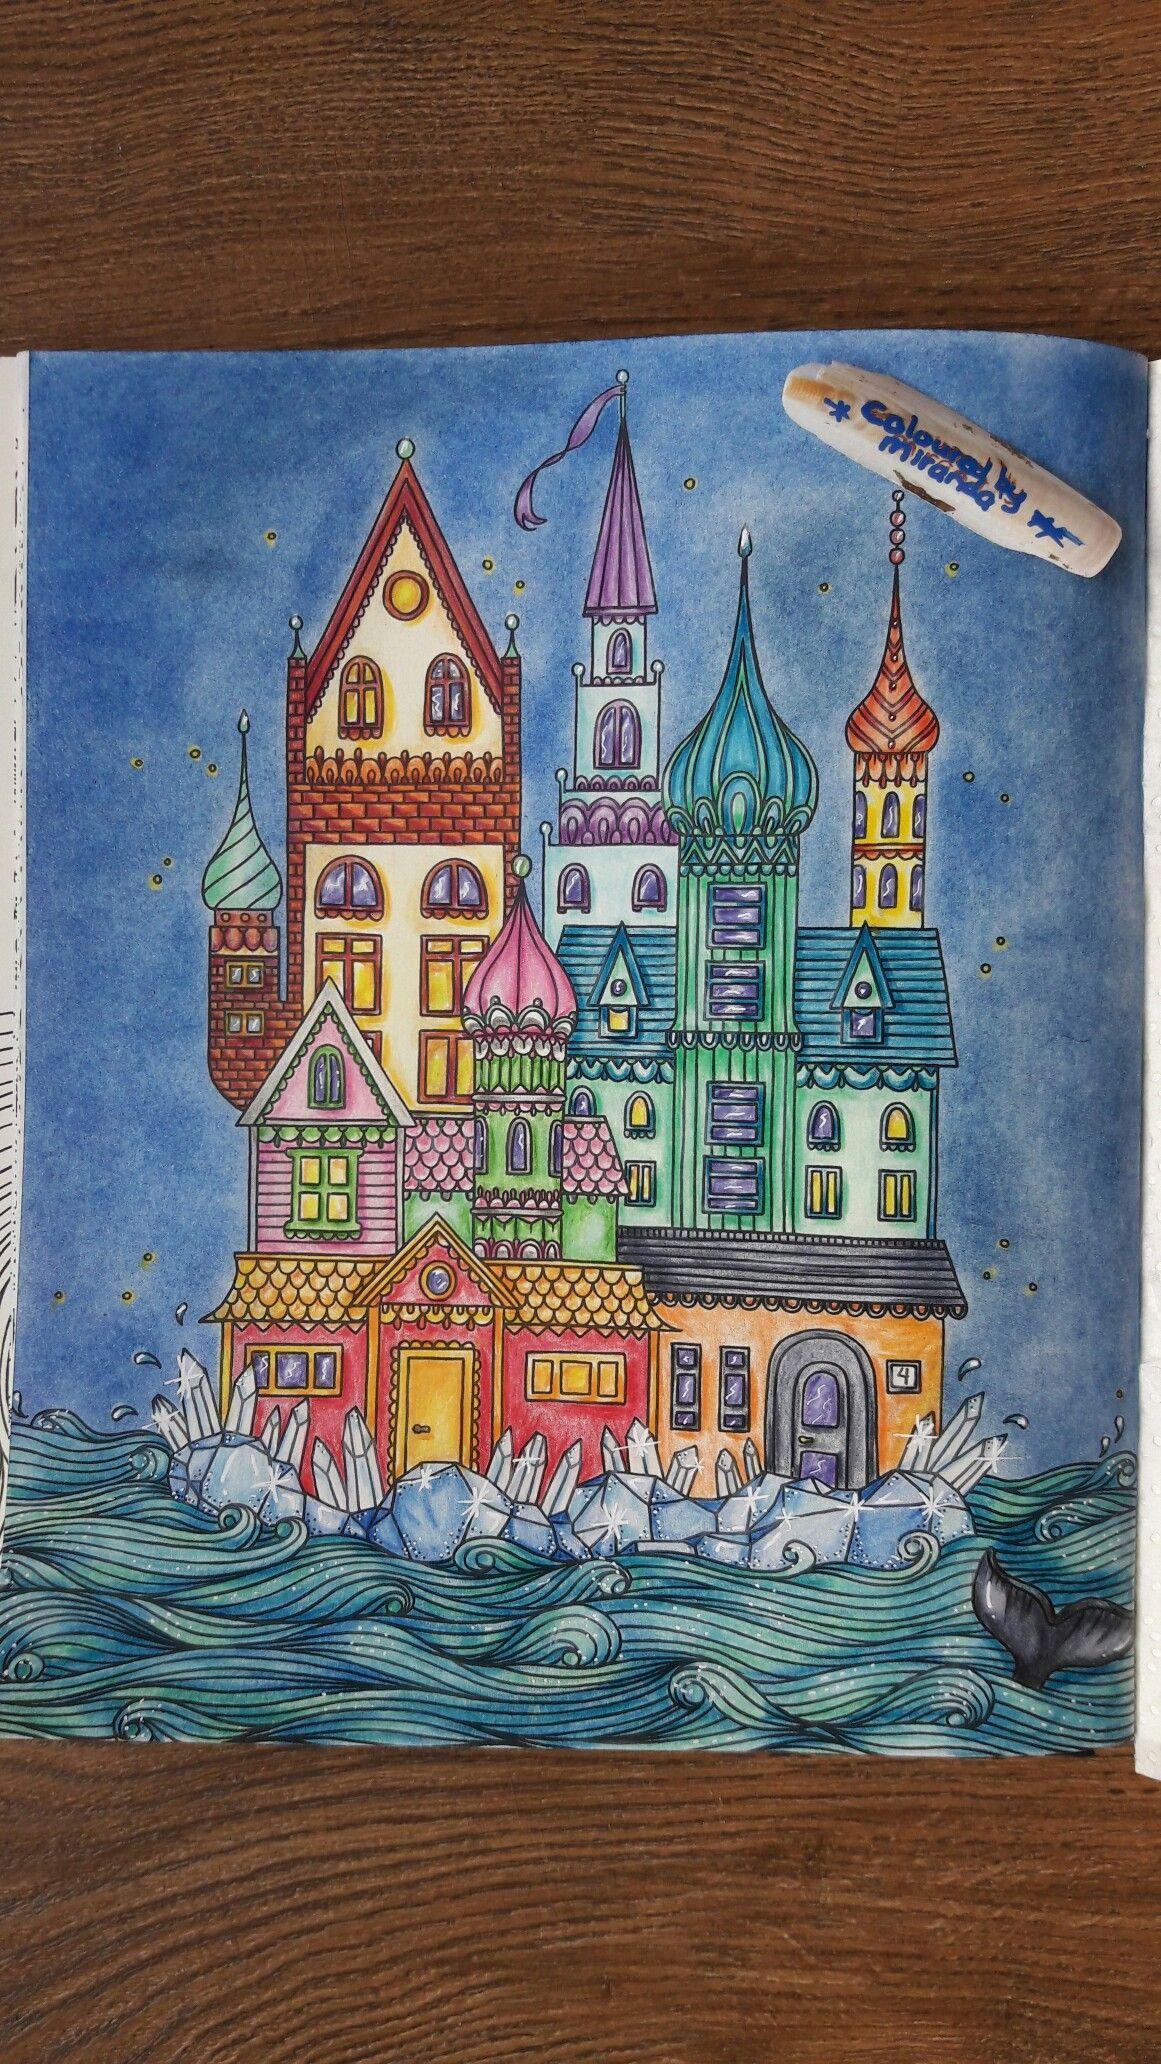 Hannakarlzon Sommarnatt Faber Castell Polychromos And Chalk Pastels Posca Coloring Books Chalk Pastels Coloring Book Pages